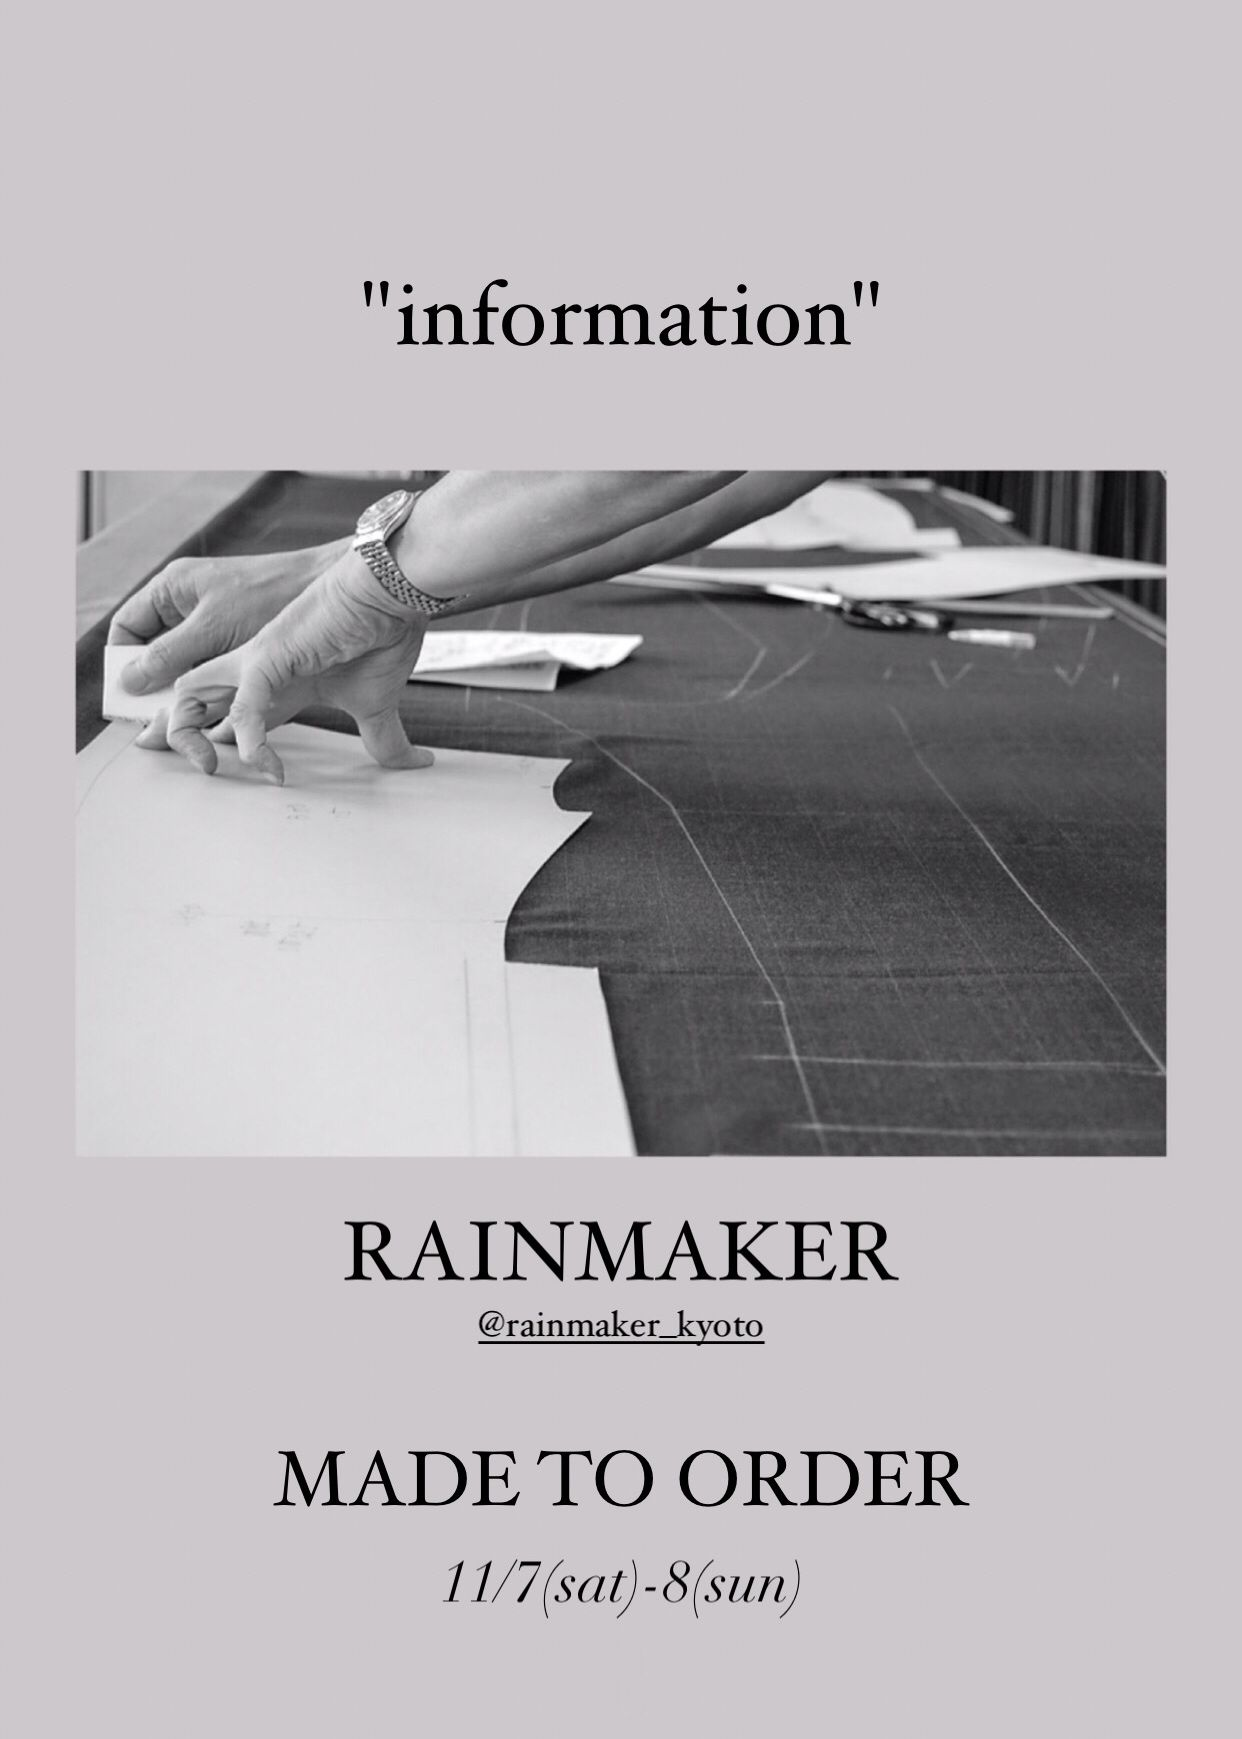 RAINMAKER MADE TO ORDER 11/7-8の写真